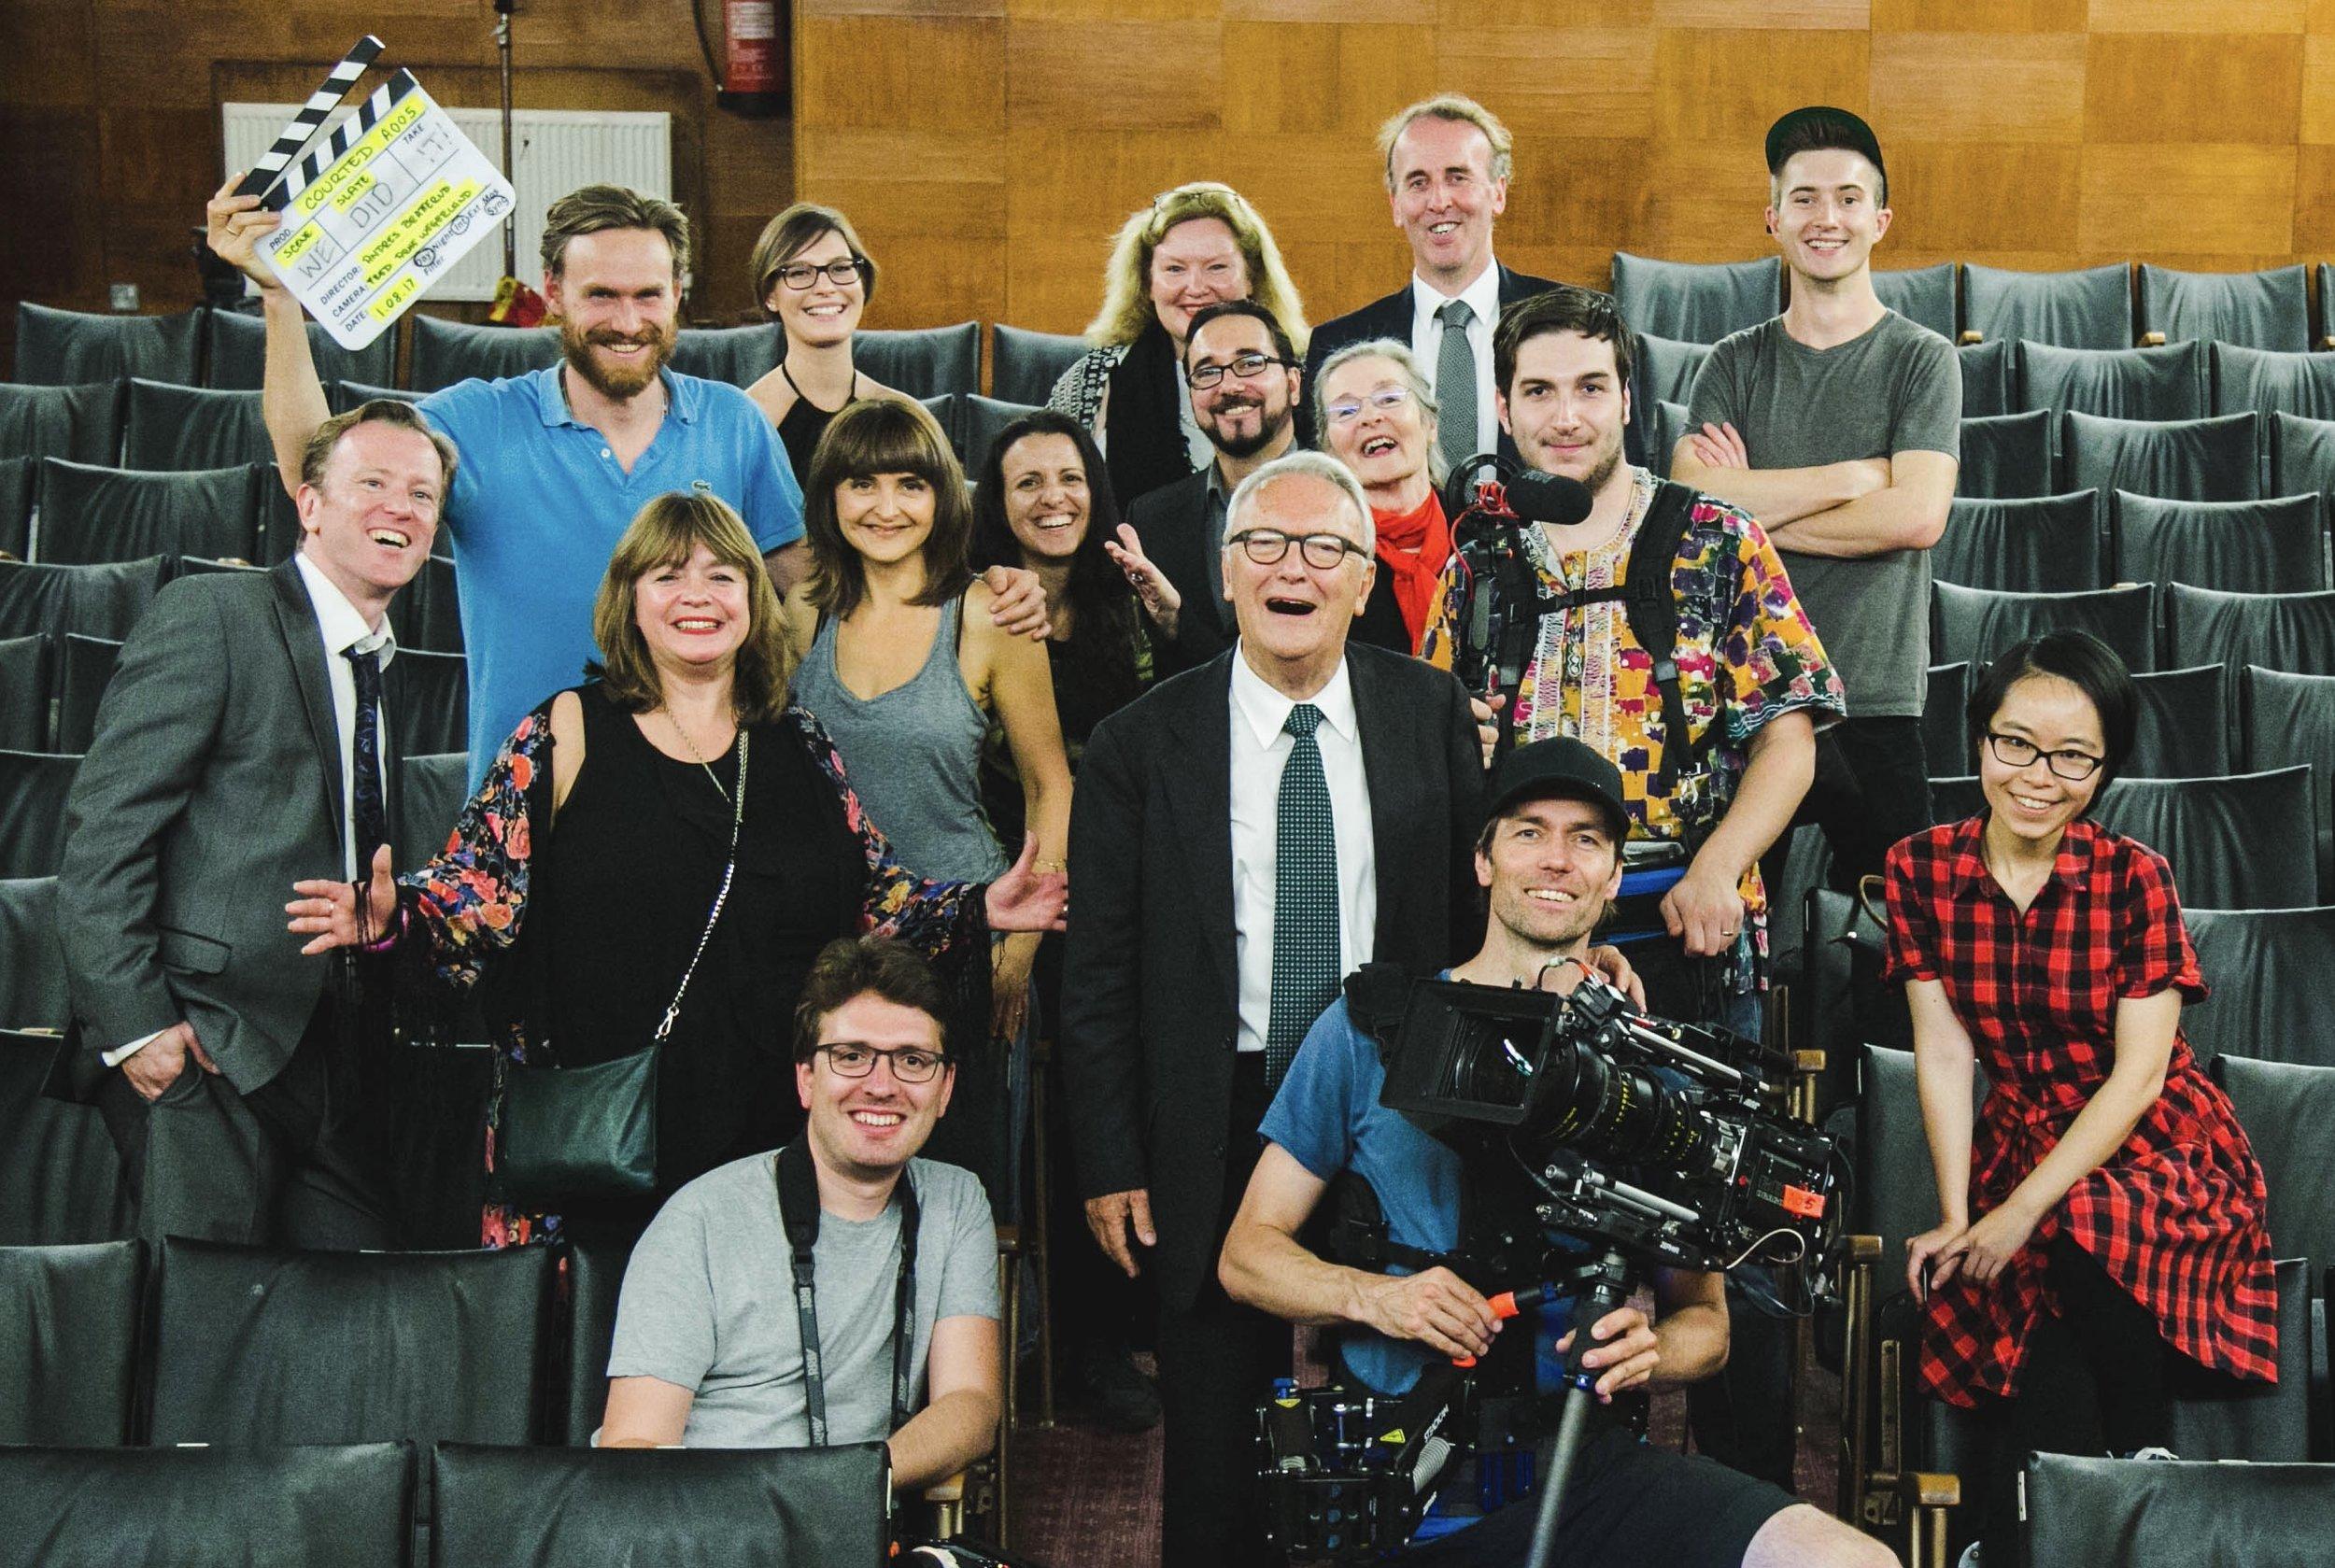 August 2017 - Final scenes remaining Cast/Crew wrap photo for @courtedfilm.